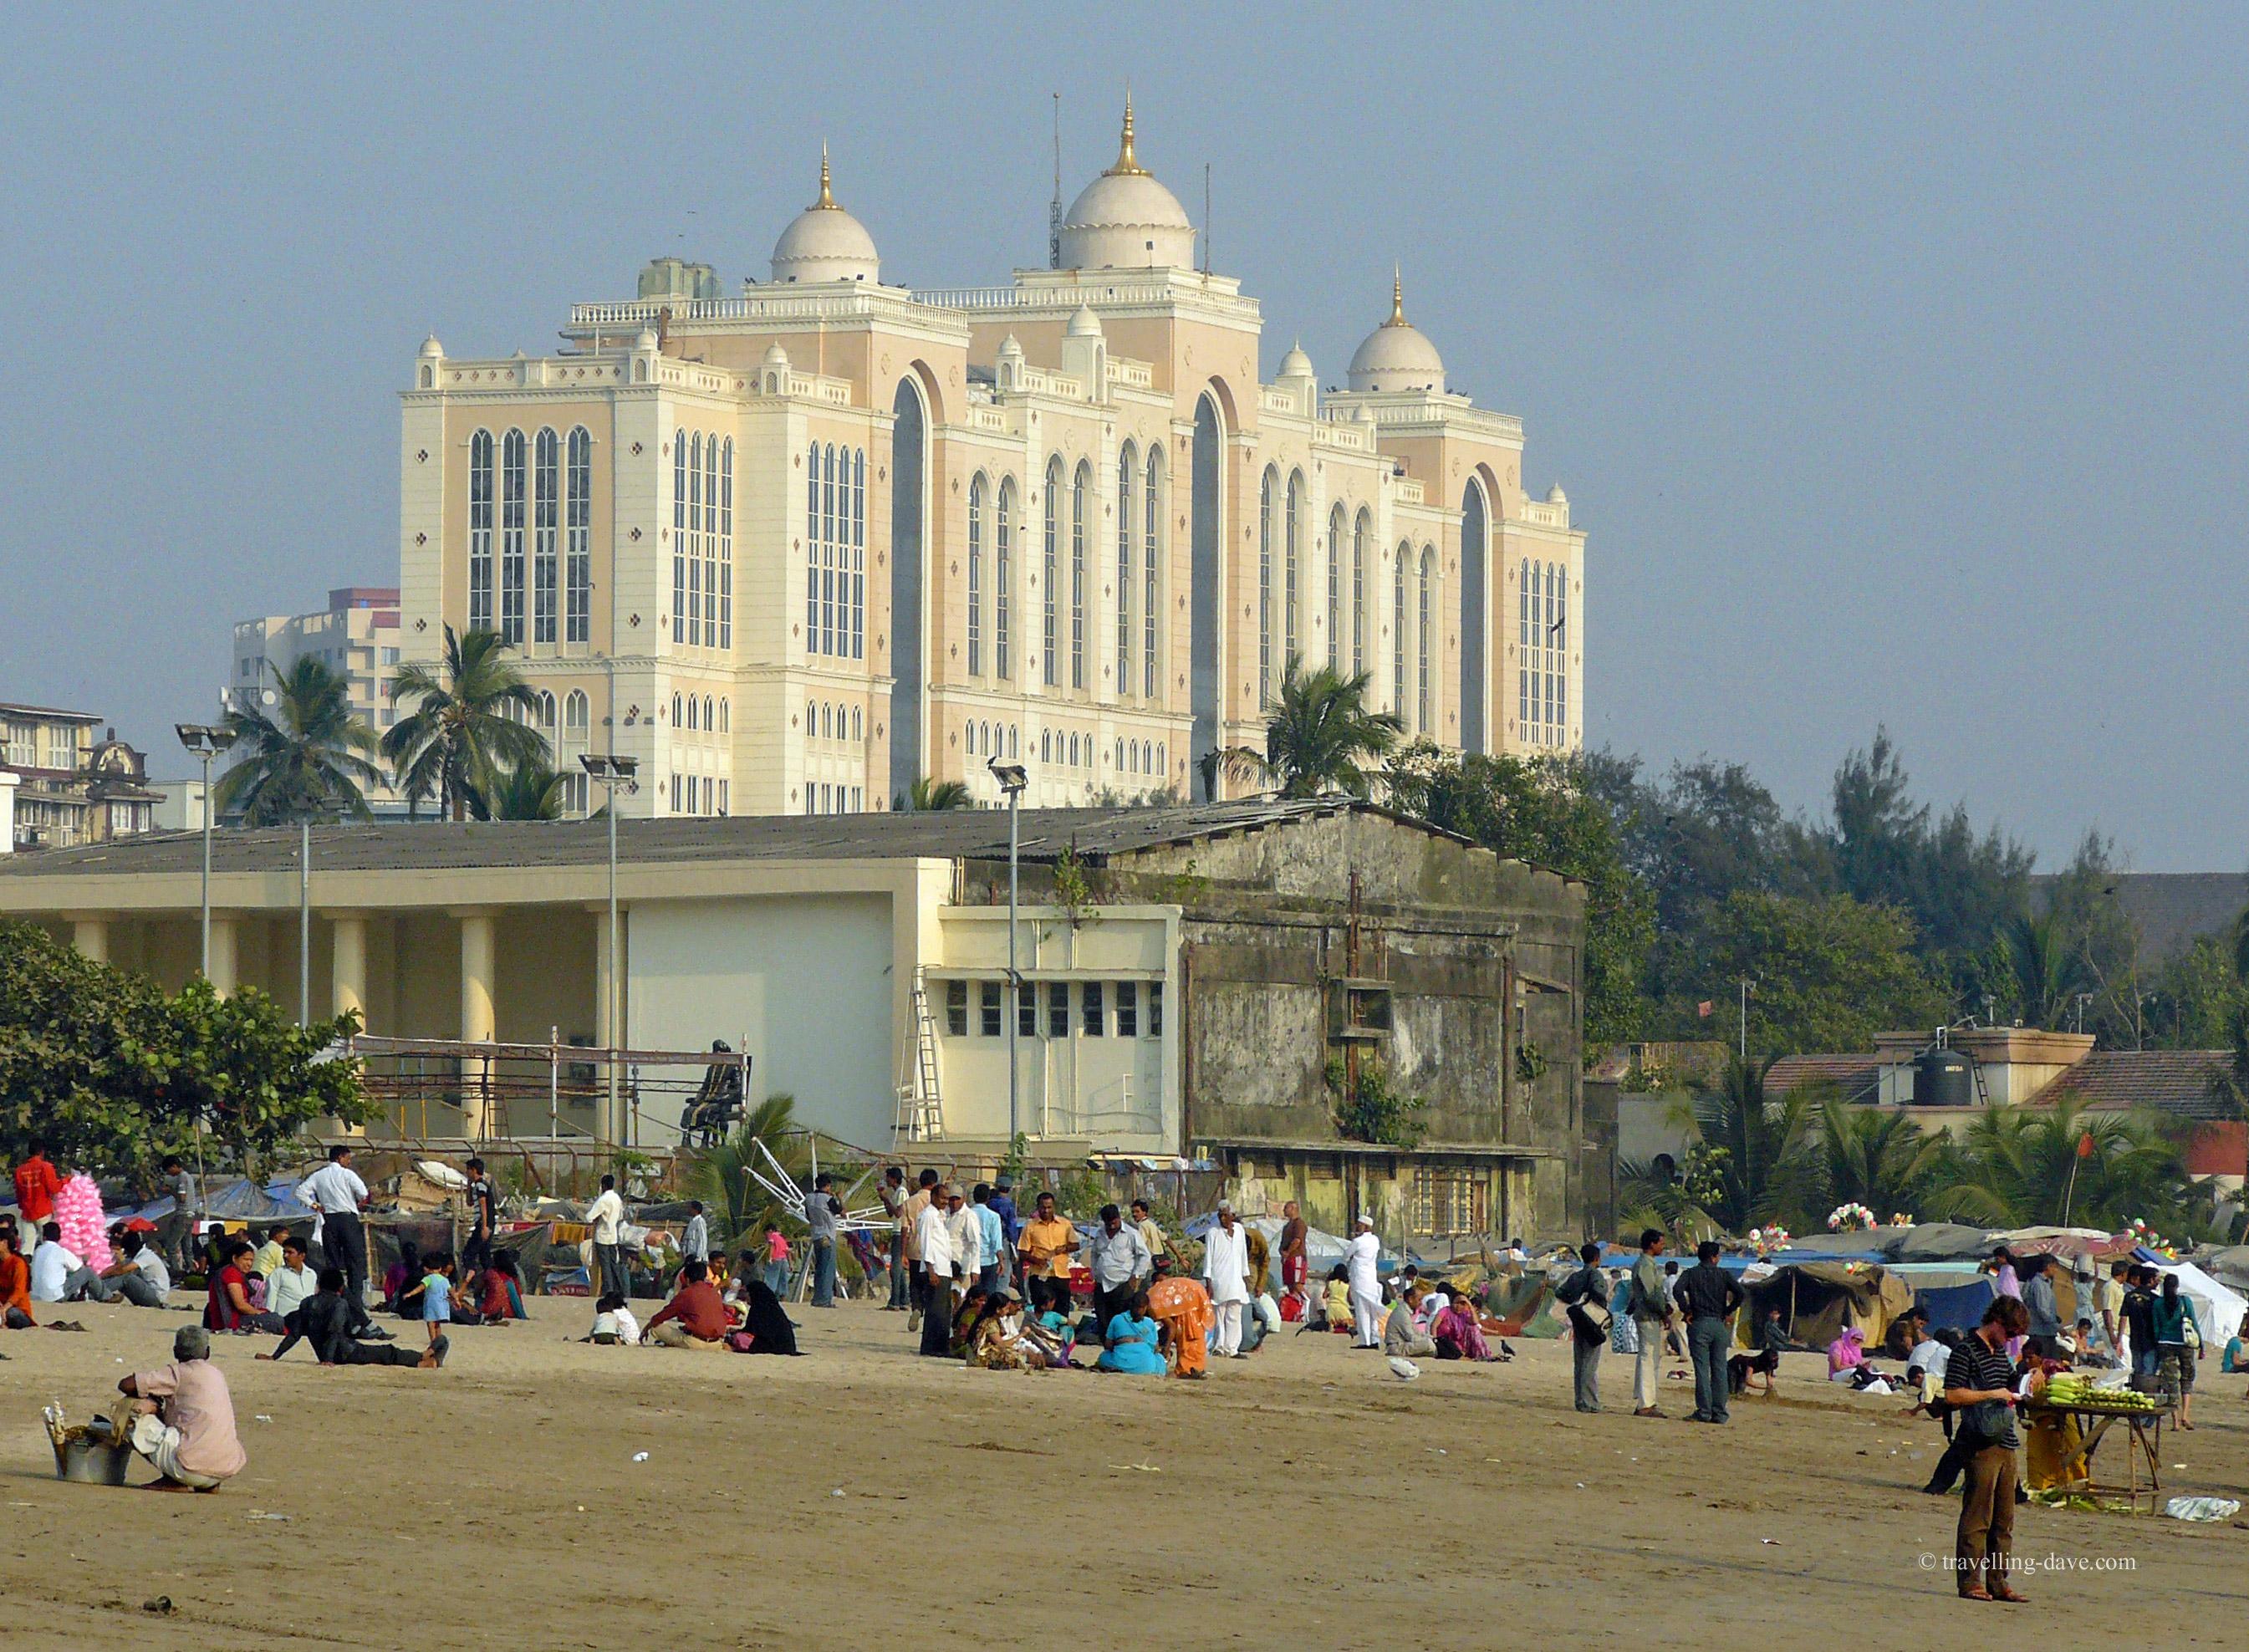 On the beach in Mumbai